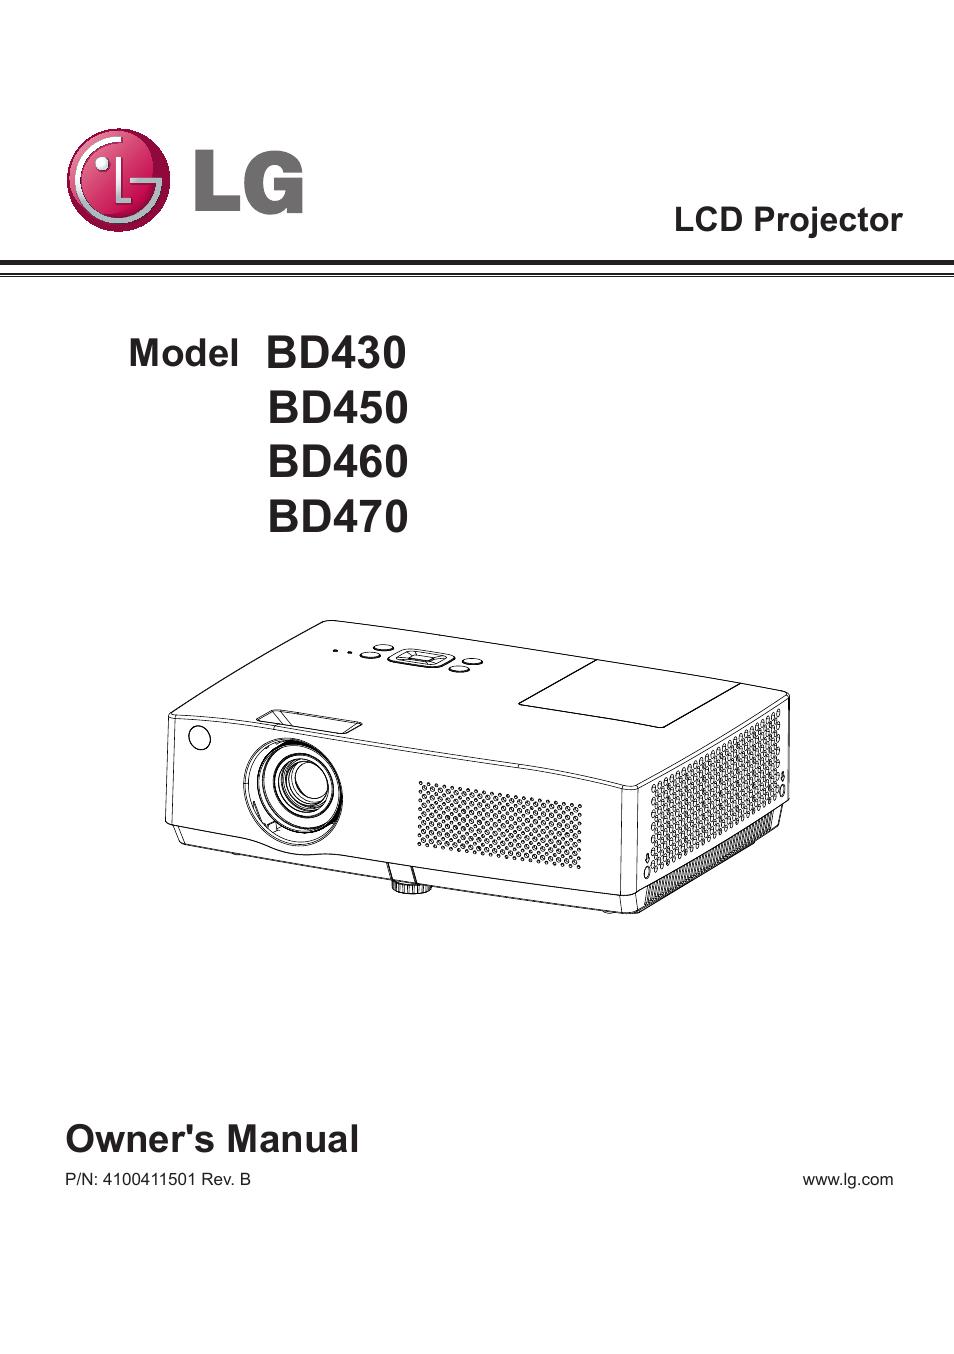 lg bd430 user manual 73 pages also for bd460 bd450 rh manualsdir com lg 4370 manual lg 430g manual